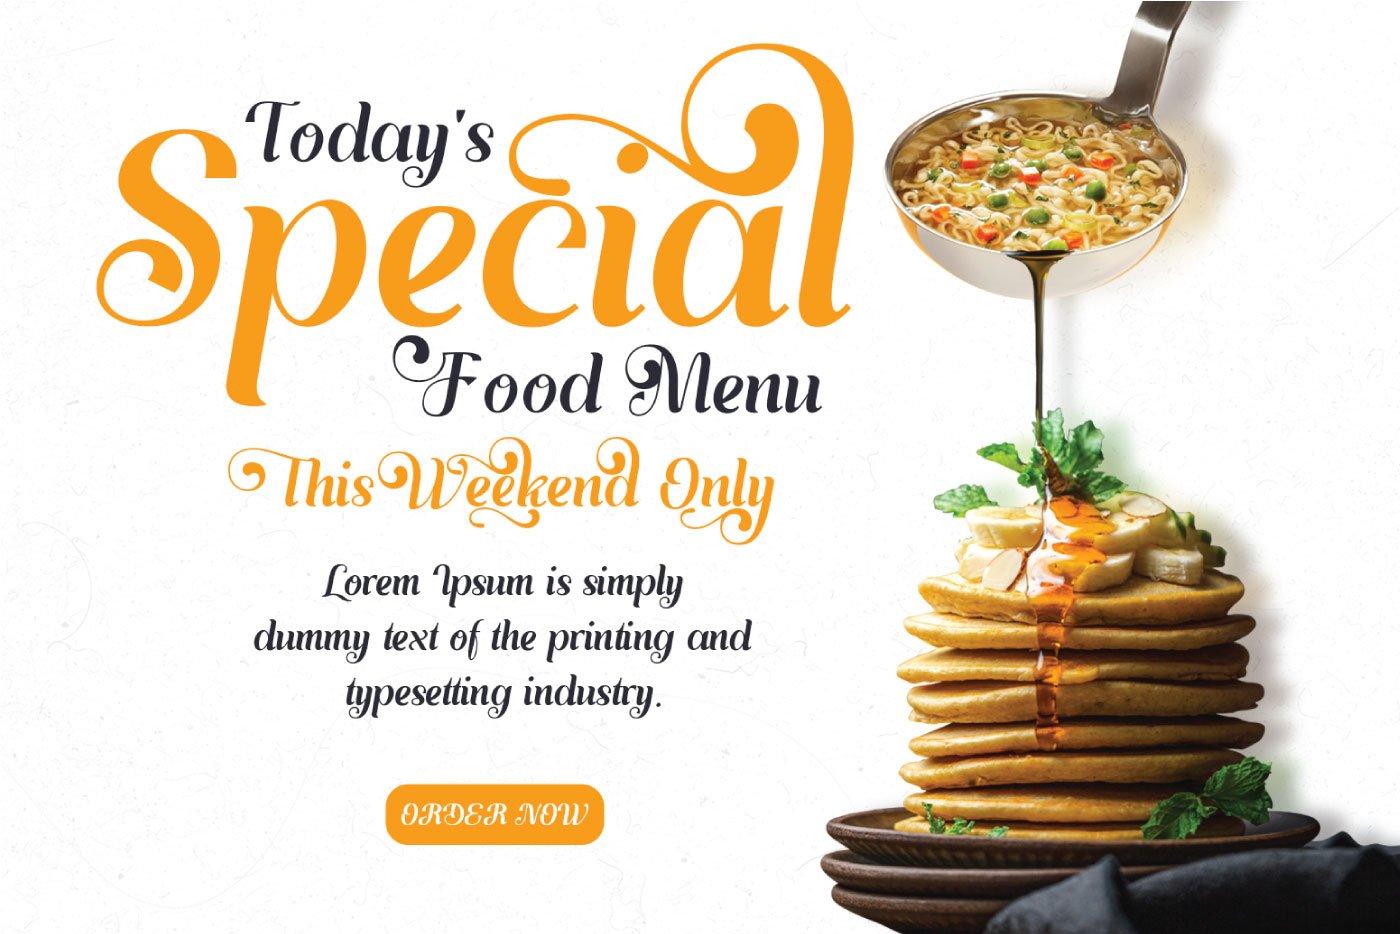 Special food menu written by Ayulia Molga Handwritten Font.